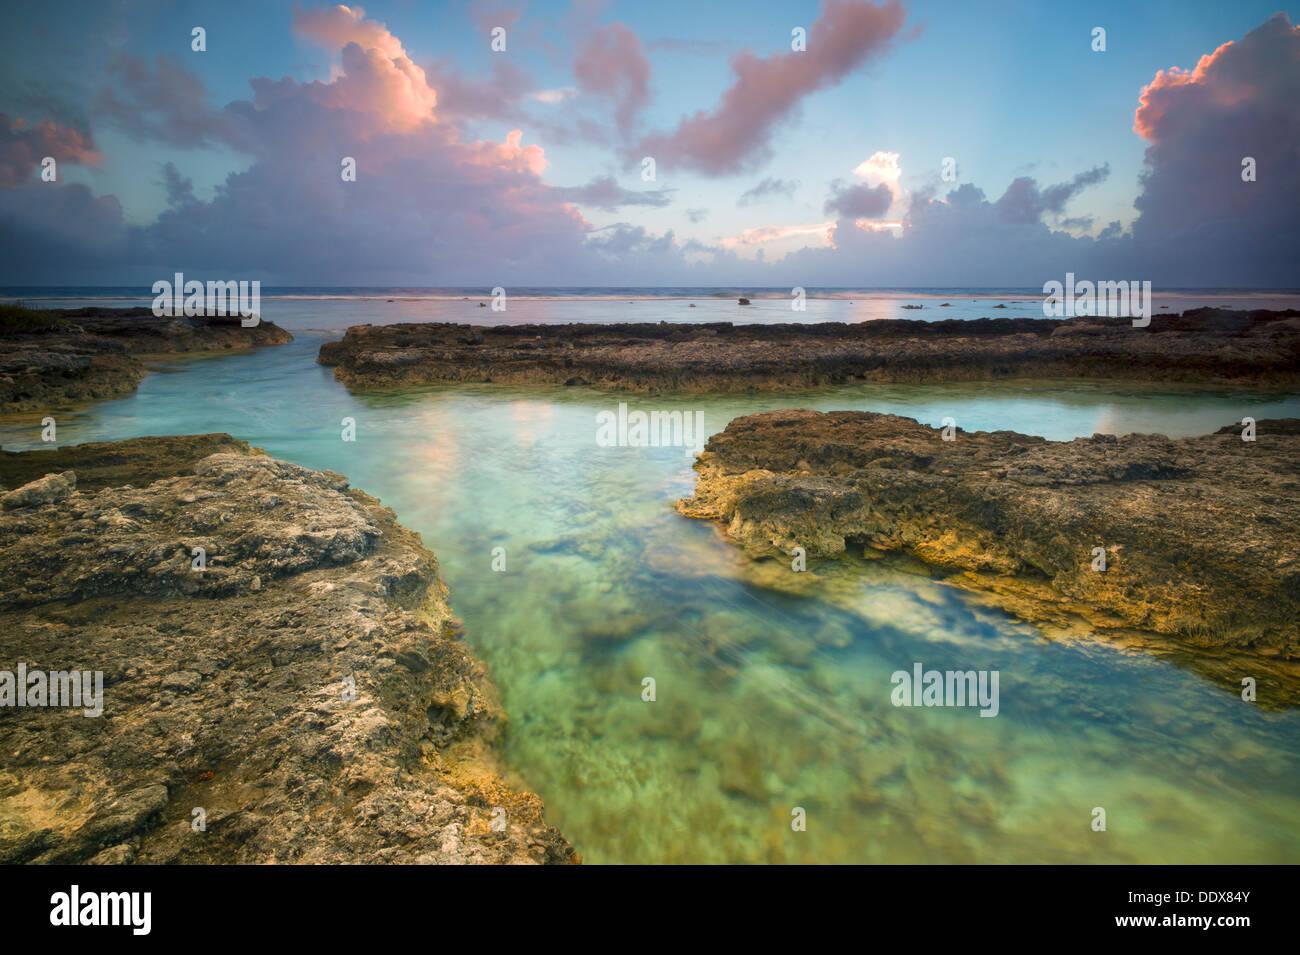 Sunrise shot del lado del Océano Pacífico de Bora Bora. La Polinesia Francesa Foto de stock